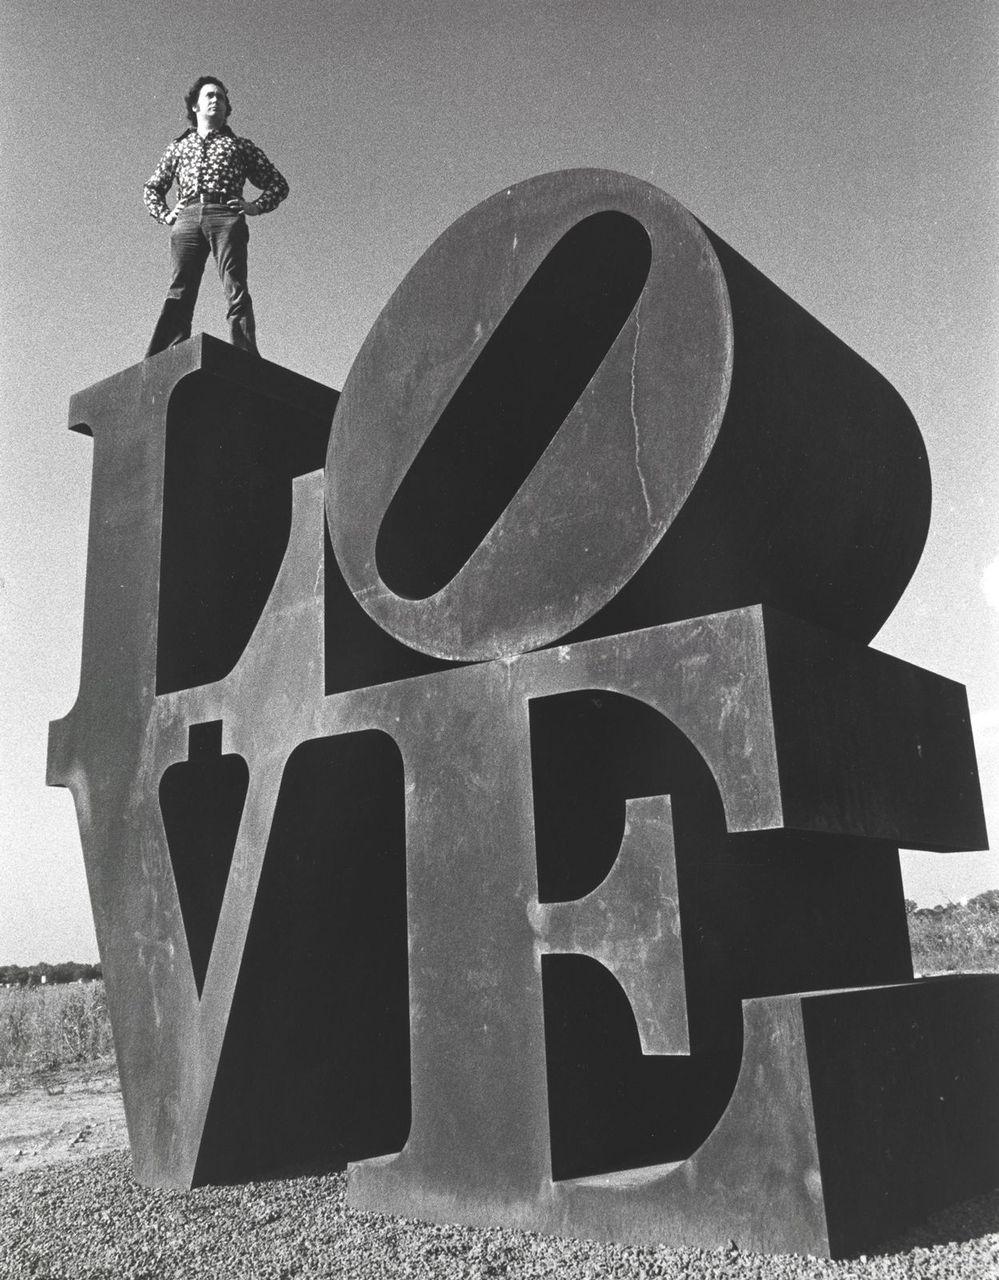 3D Four Letter Words Robert Indianas LOVE Sculptures In